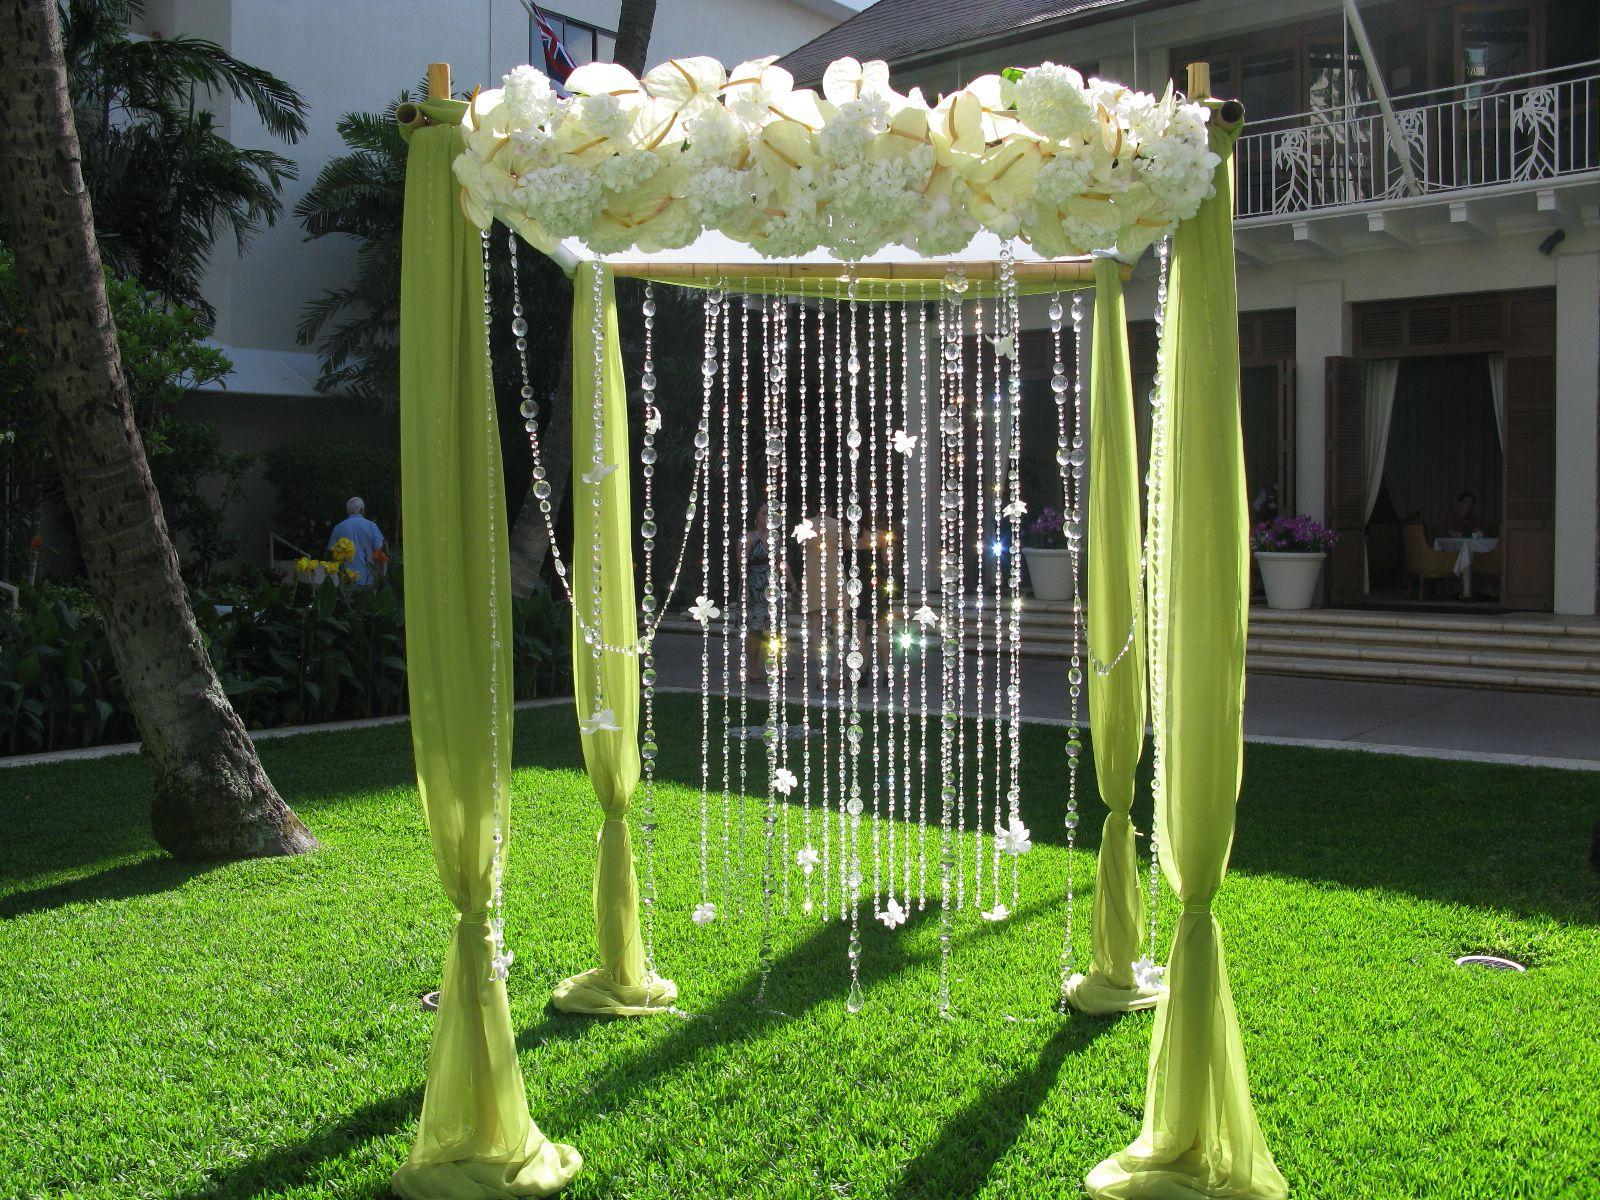 Hanging Crystals, kiwi fabric,